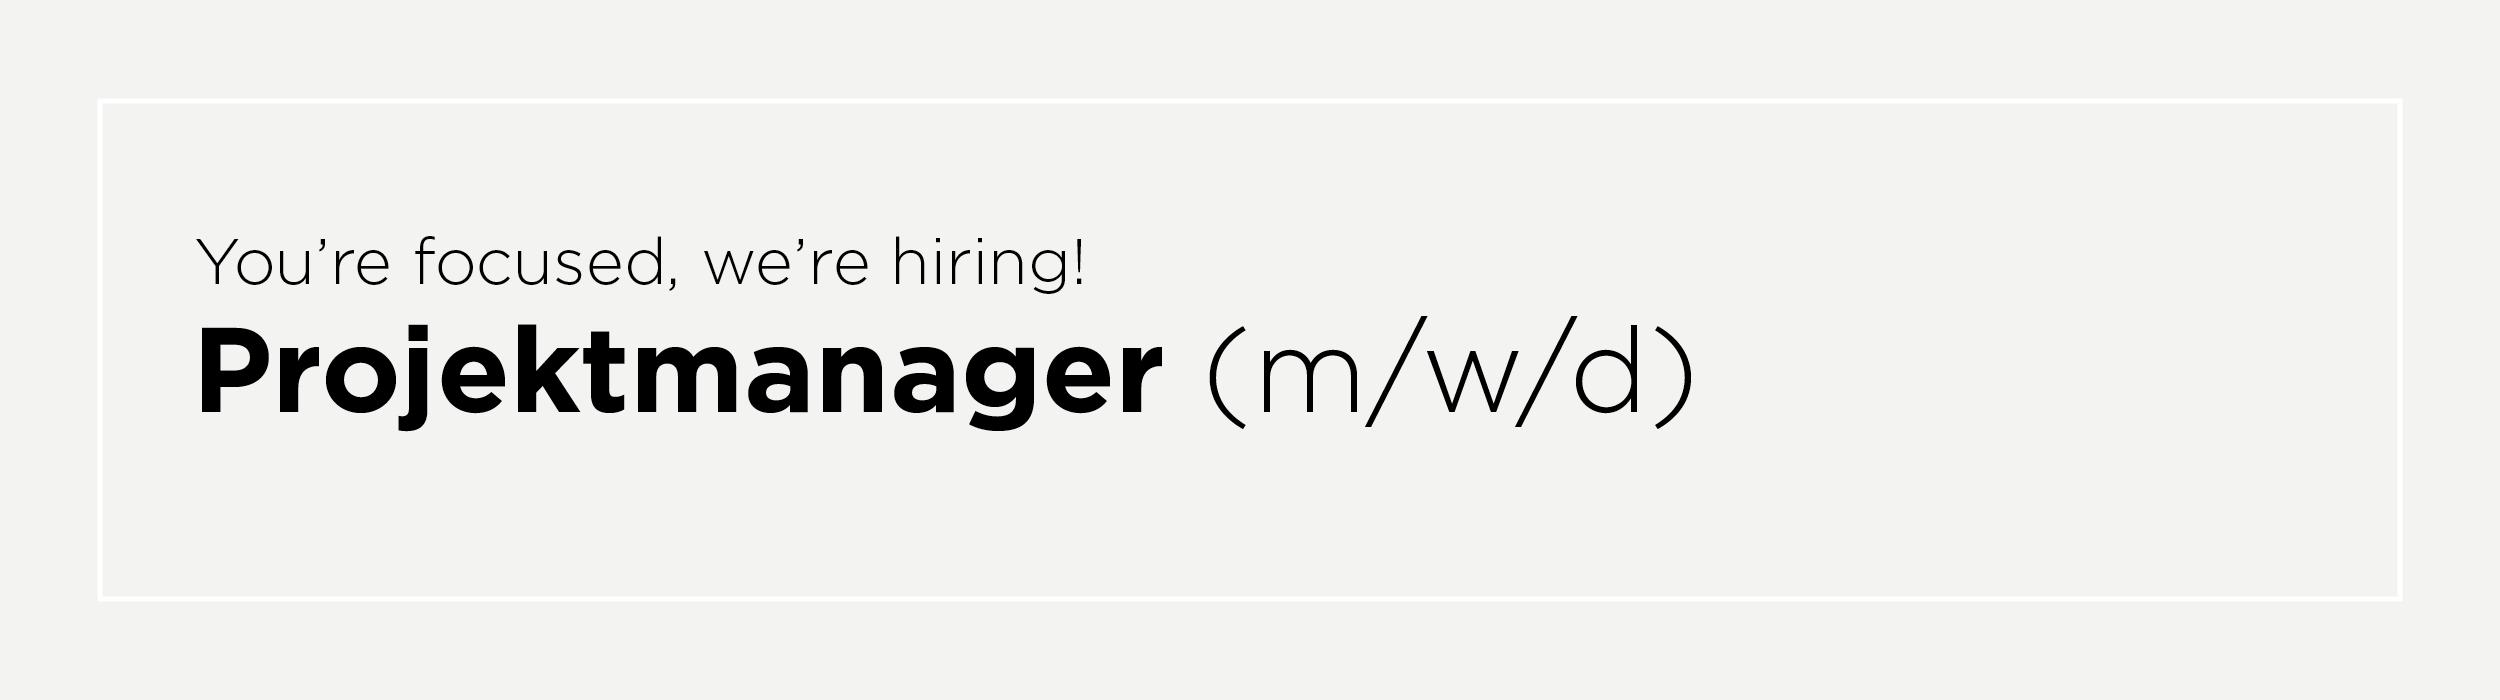 Projektmanager (m/w/d)